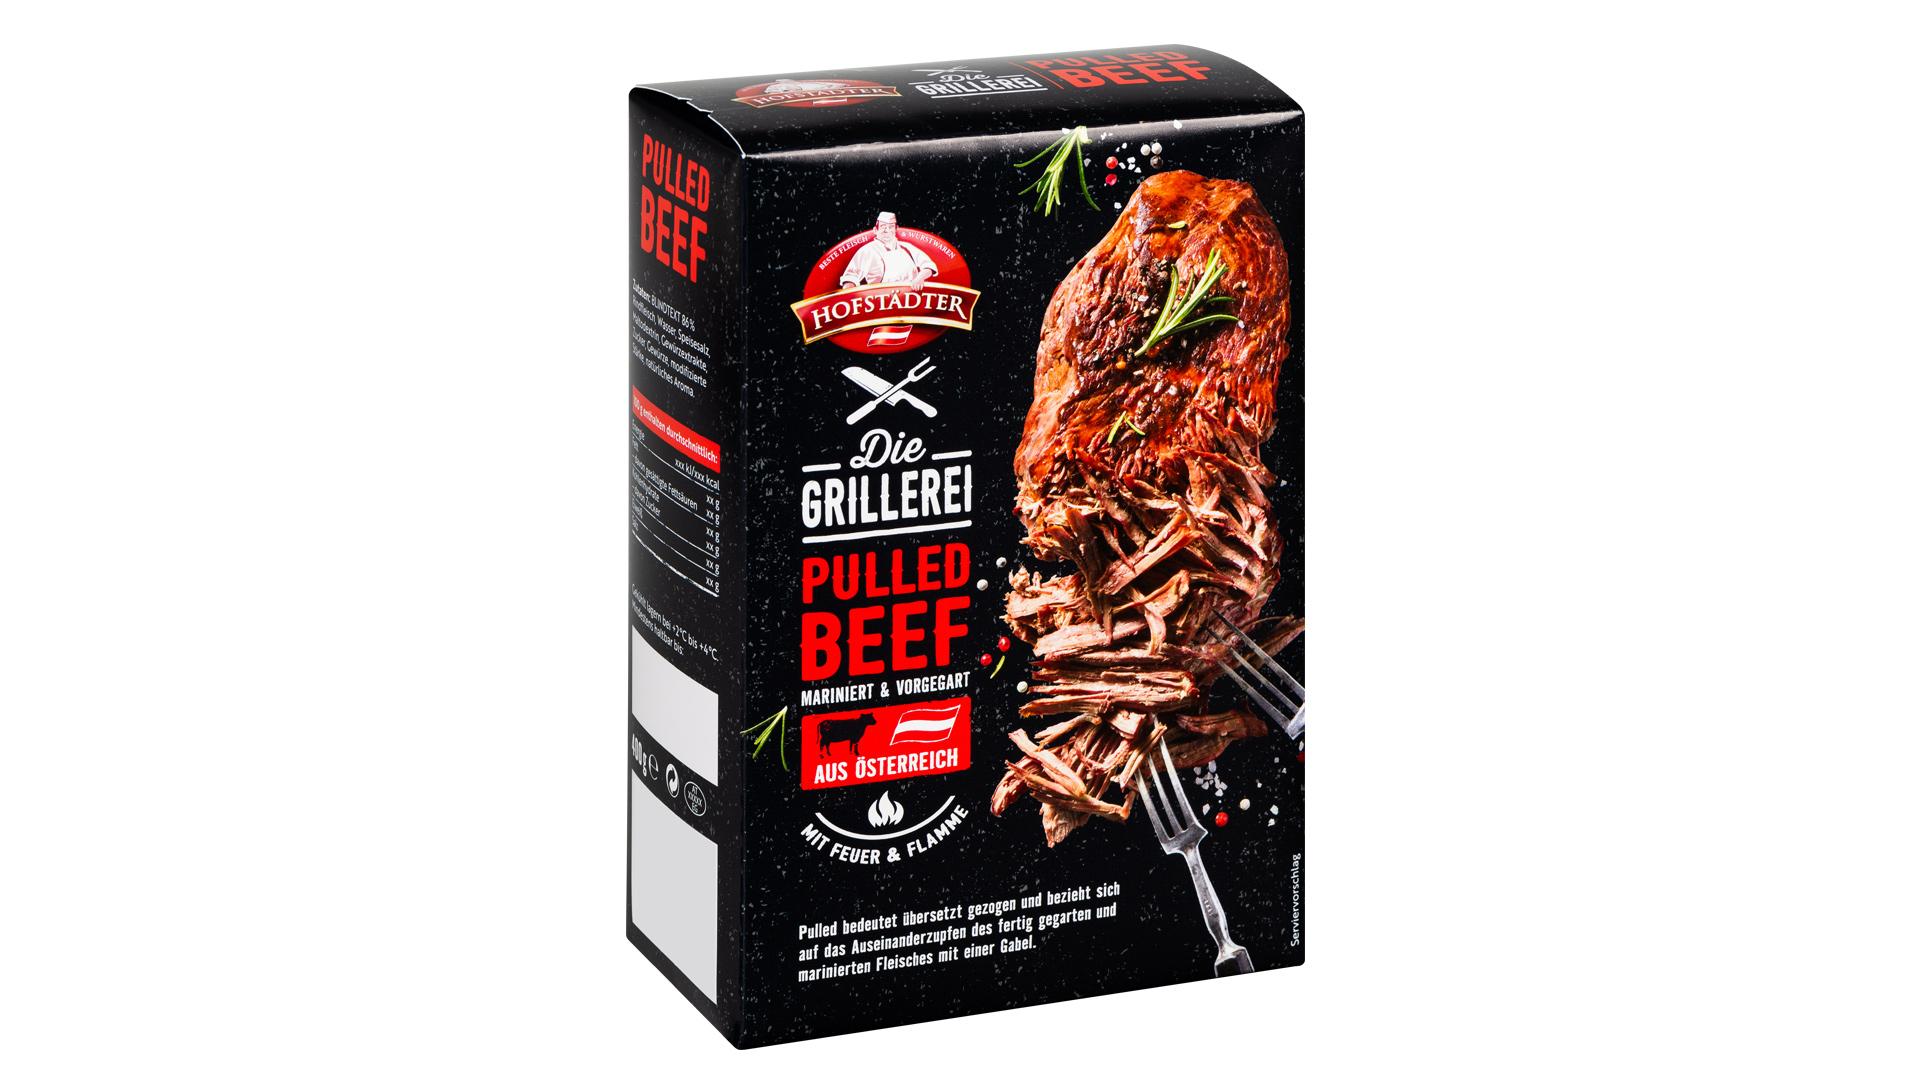 Hofstädter Pulled Beef Packshot